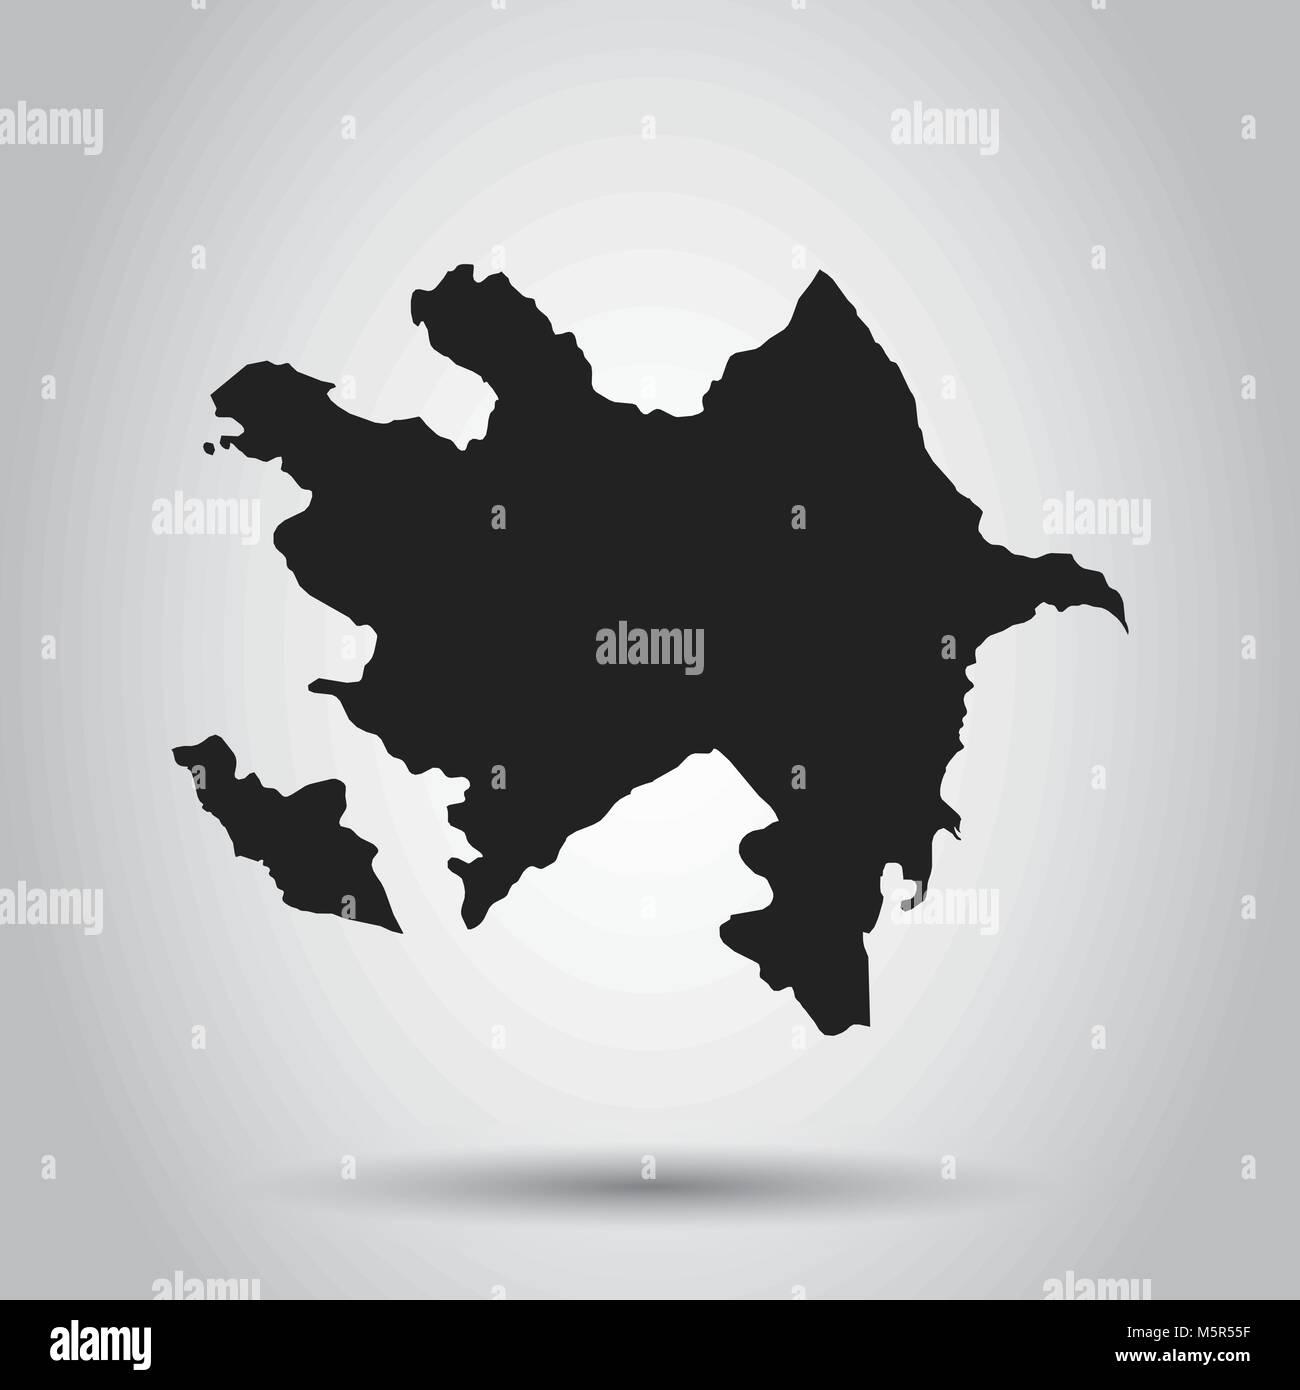 Azerbaijan vector map black icon on white background stock vector azerbaijan vector map black icon on white background gumiabroncs Image collections